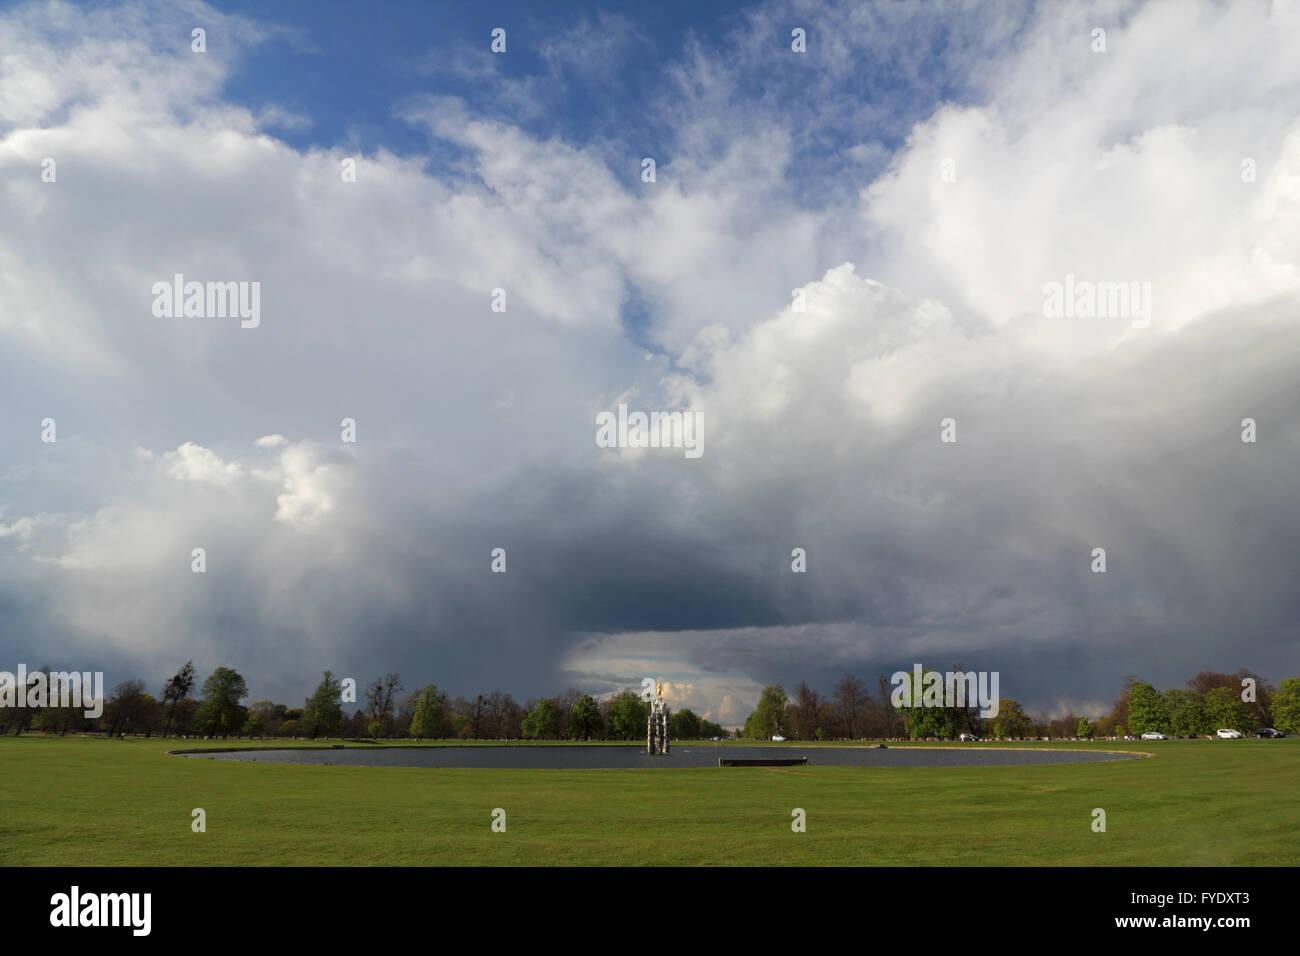 Bushy Park, London, UK. 26th April 2016. UK Weather: Huge cumulonimbus clouds pass over the Diana Fountain in Bushy - Stock Image